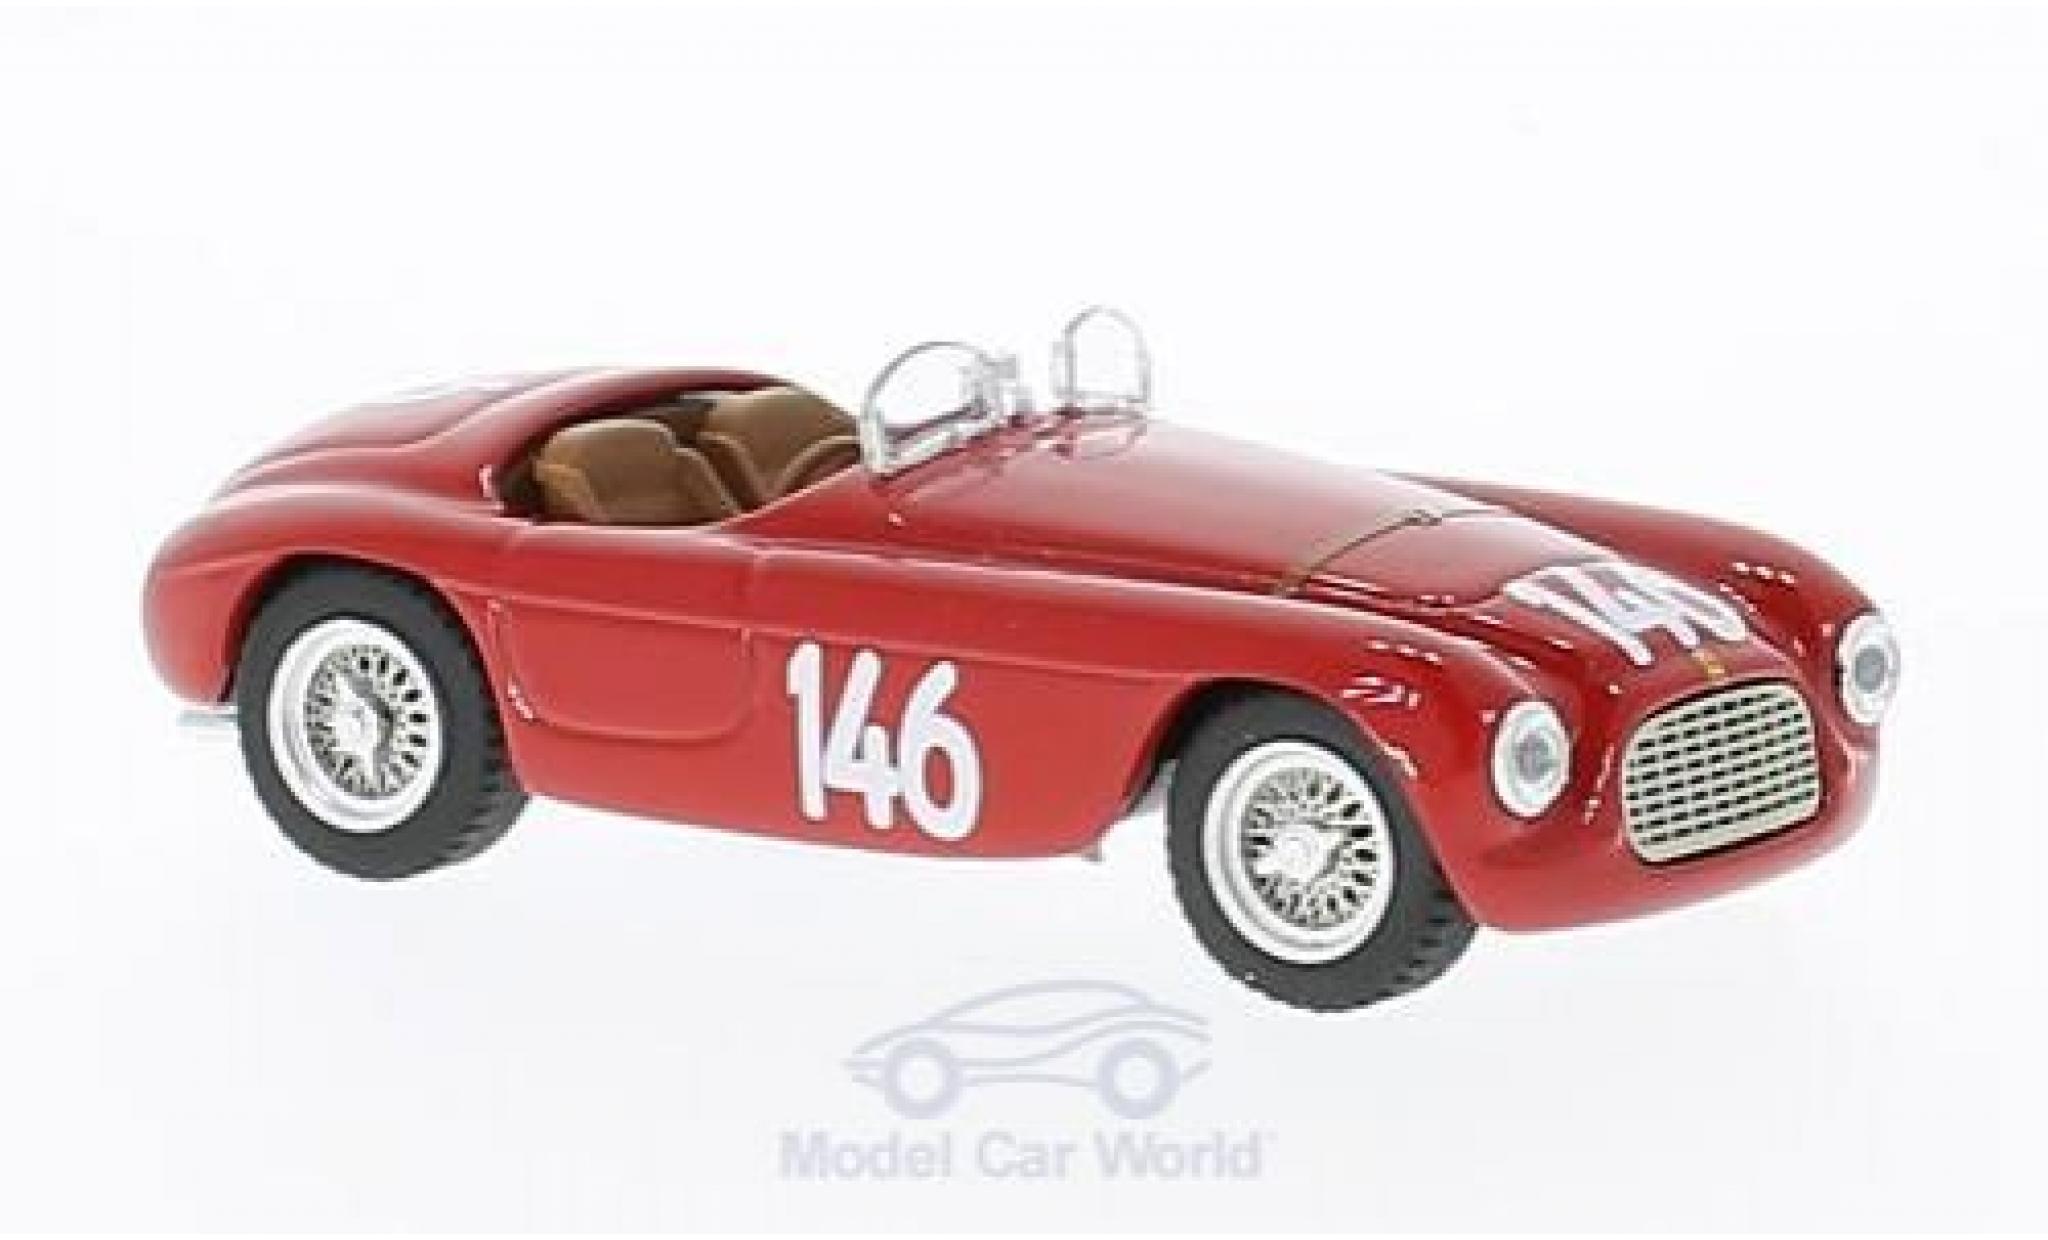 Ferrari 166 1950 1/43 Art Model MM Barchetta RHD No.146 Coppa Dolomiti 1950 Chassis: 0034 G.Marzotto